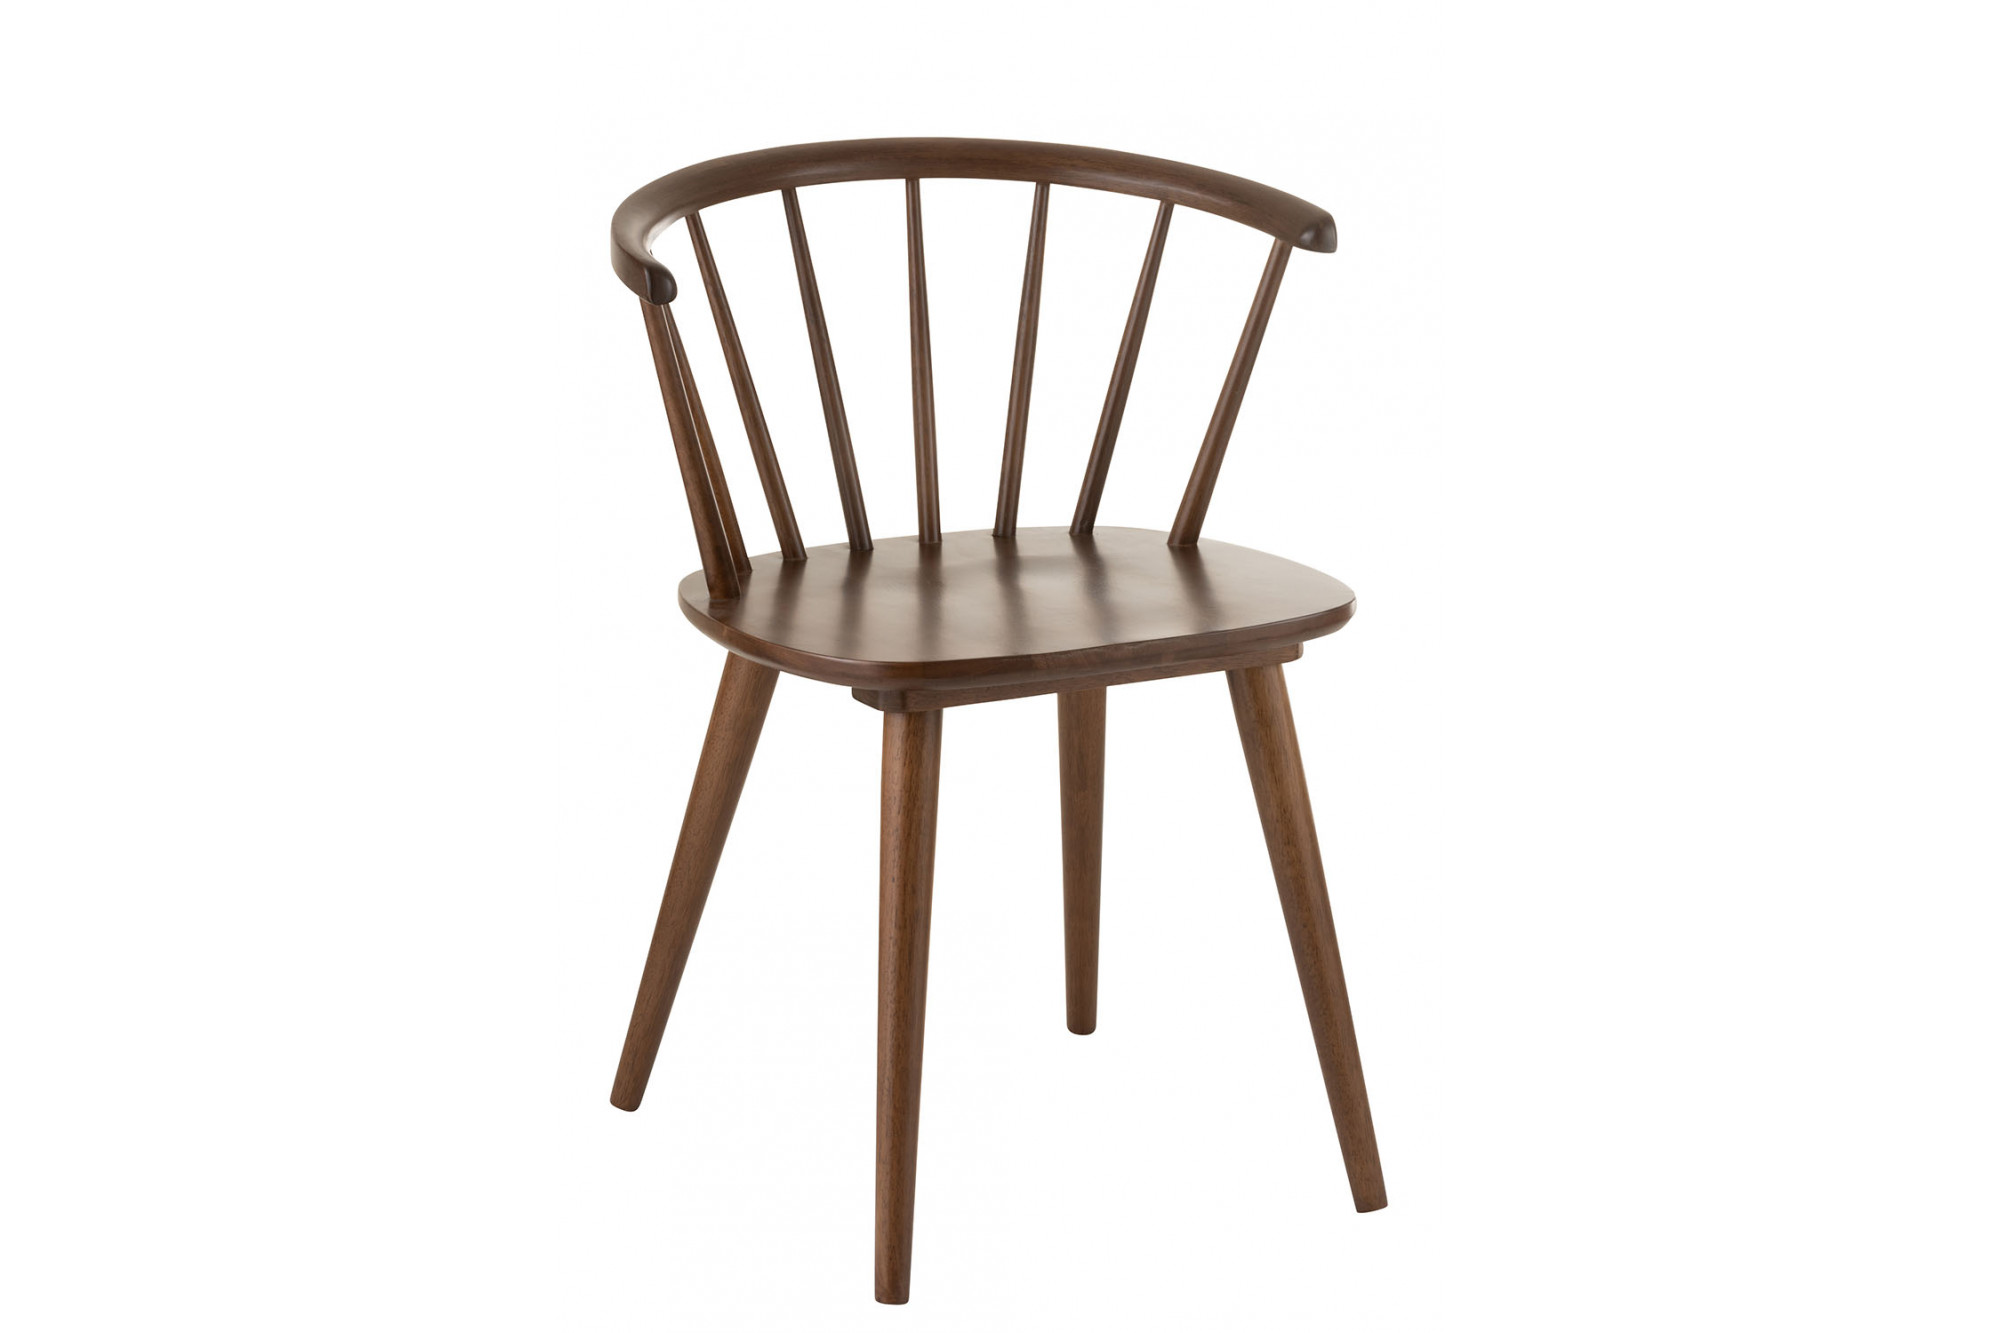 Chaise vintage en bois : scandinave / bistrot - Hellin